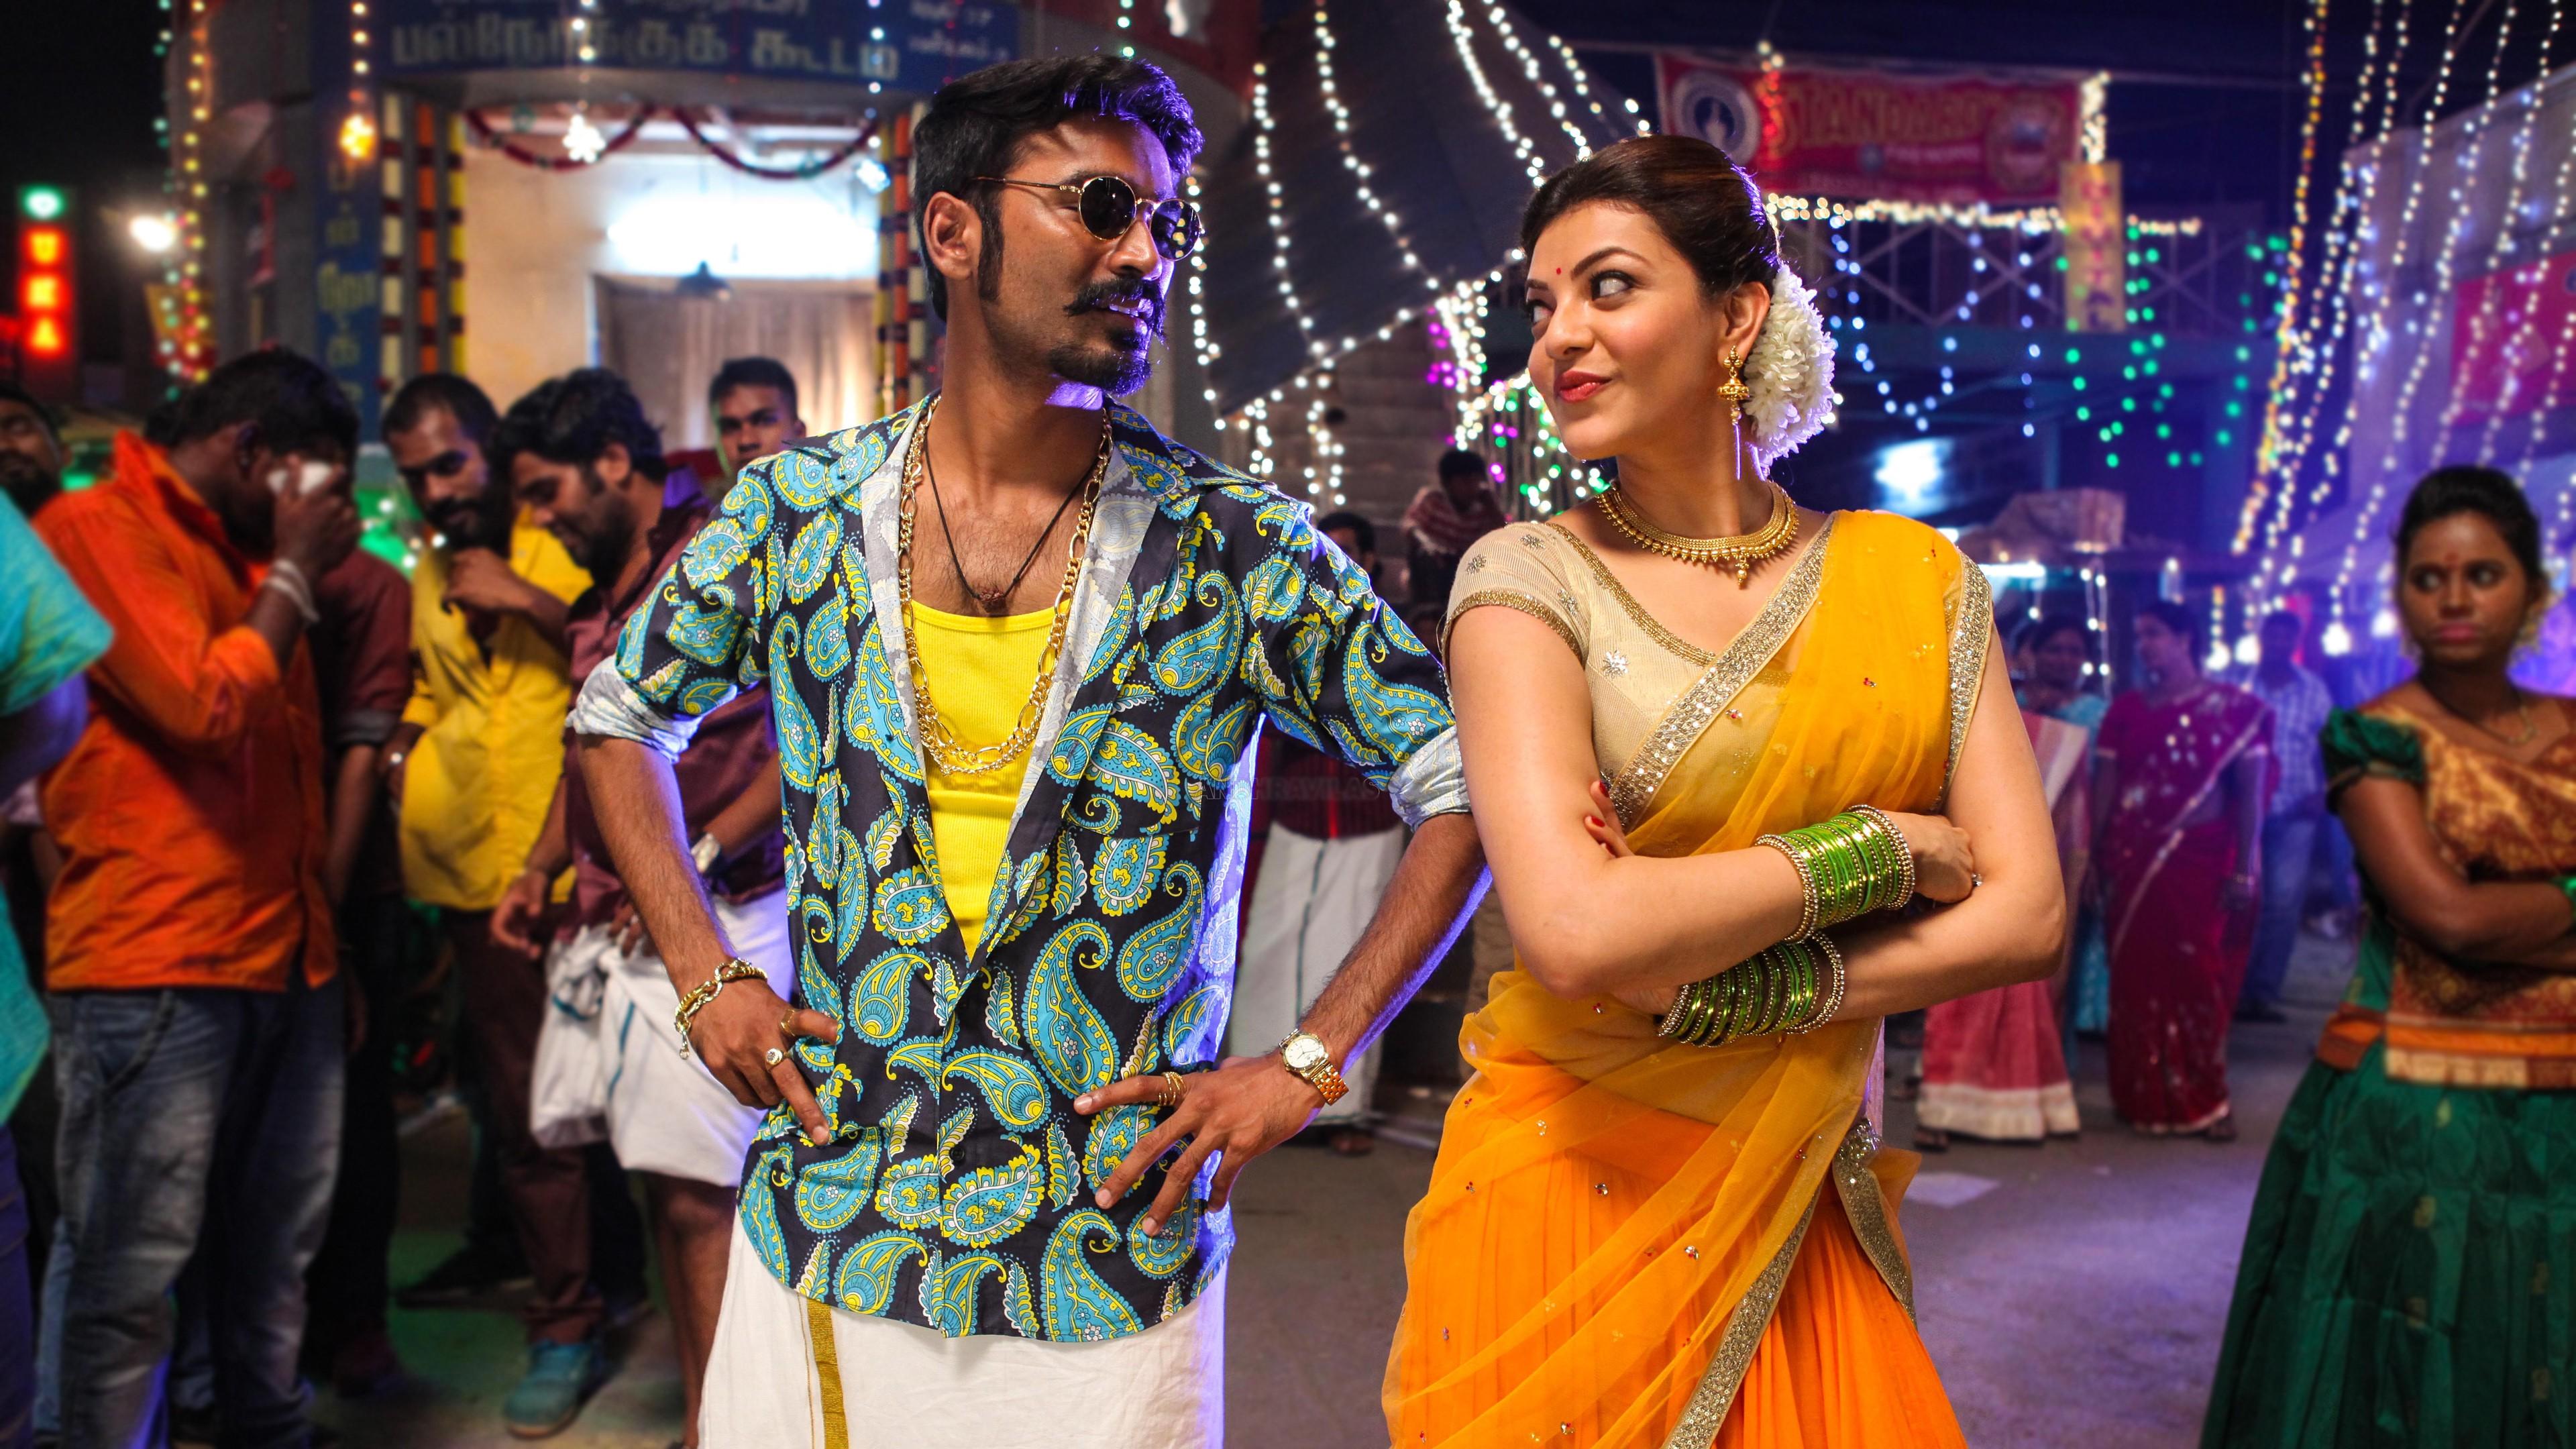 Good Wallpaper Movie Tamil - Dhanush-Kajal-Maari-Tamil-Movie-HD-Wallpapers-For-Android  Photograph_902498.jpg